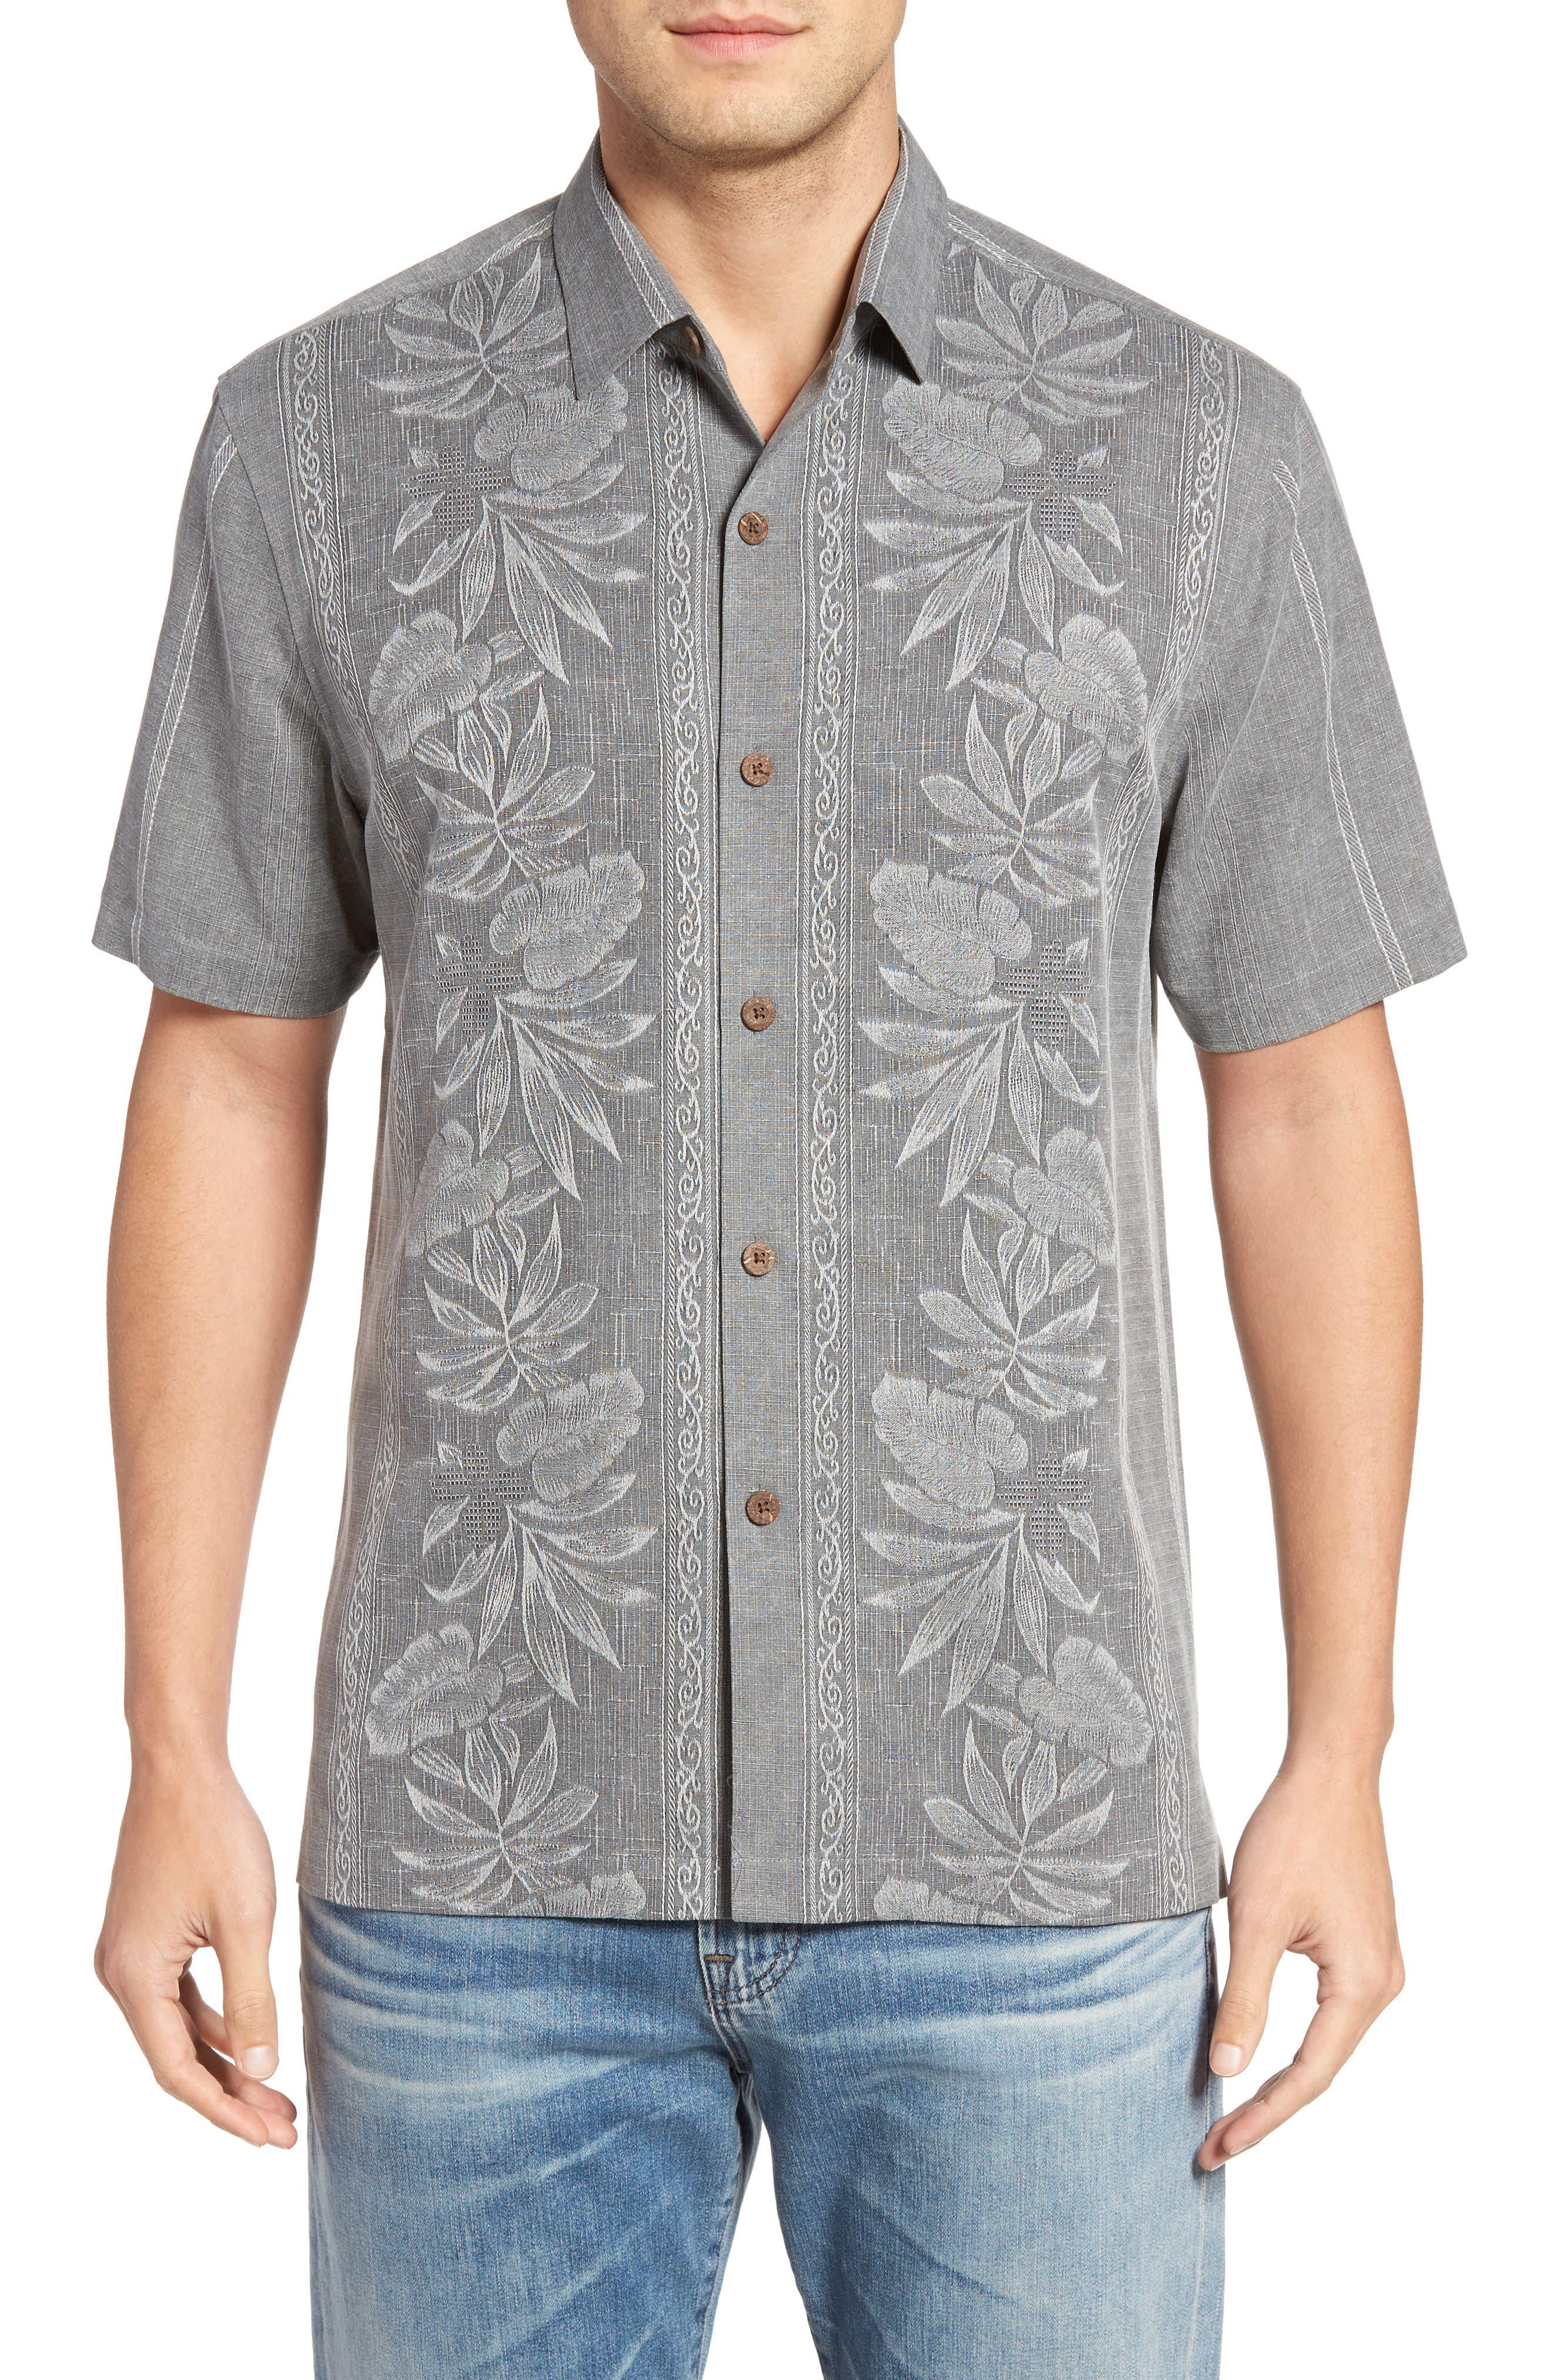 Pacific Standard Fit Floral Silk Camp Shirt,                             Main thumbnail 1, color,                             050